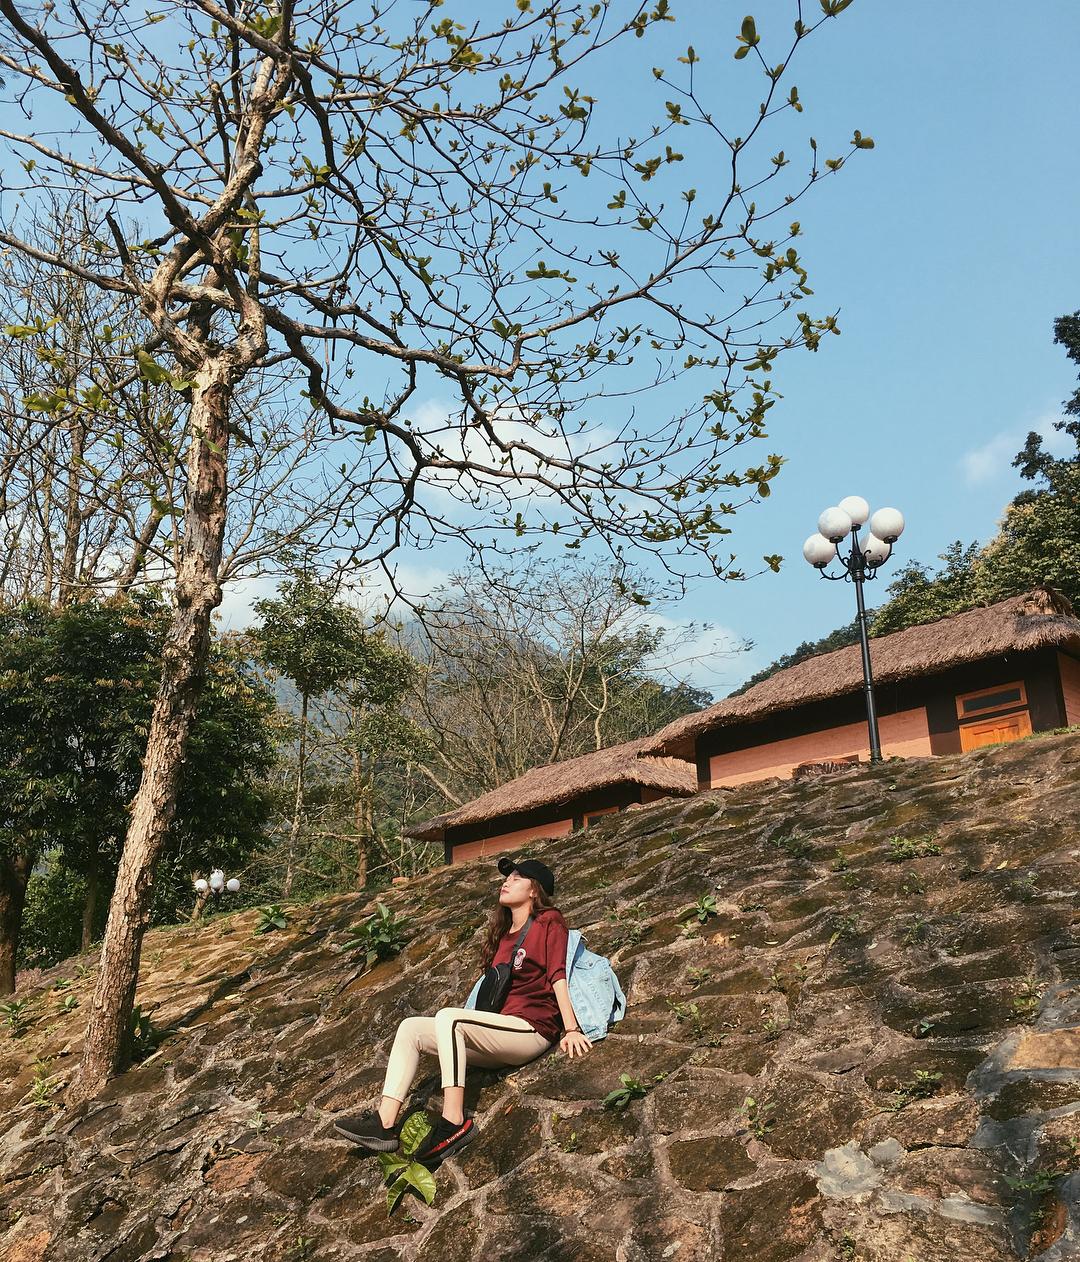 ha-noi-hanoi-paragon-resort-14